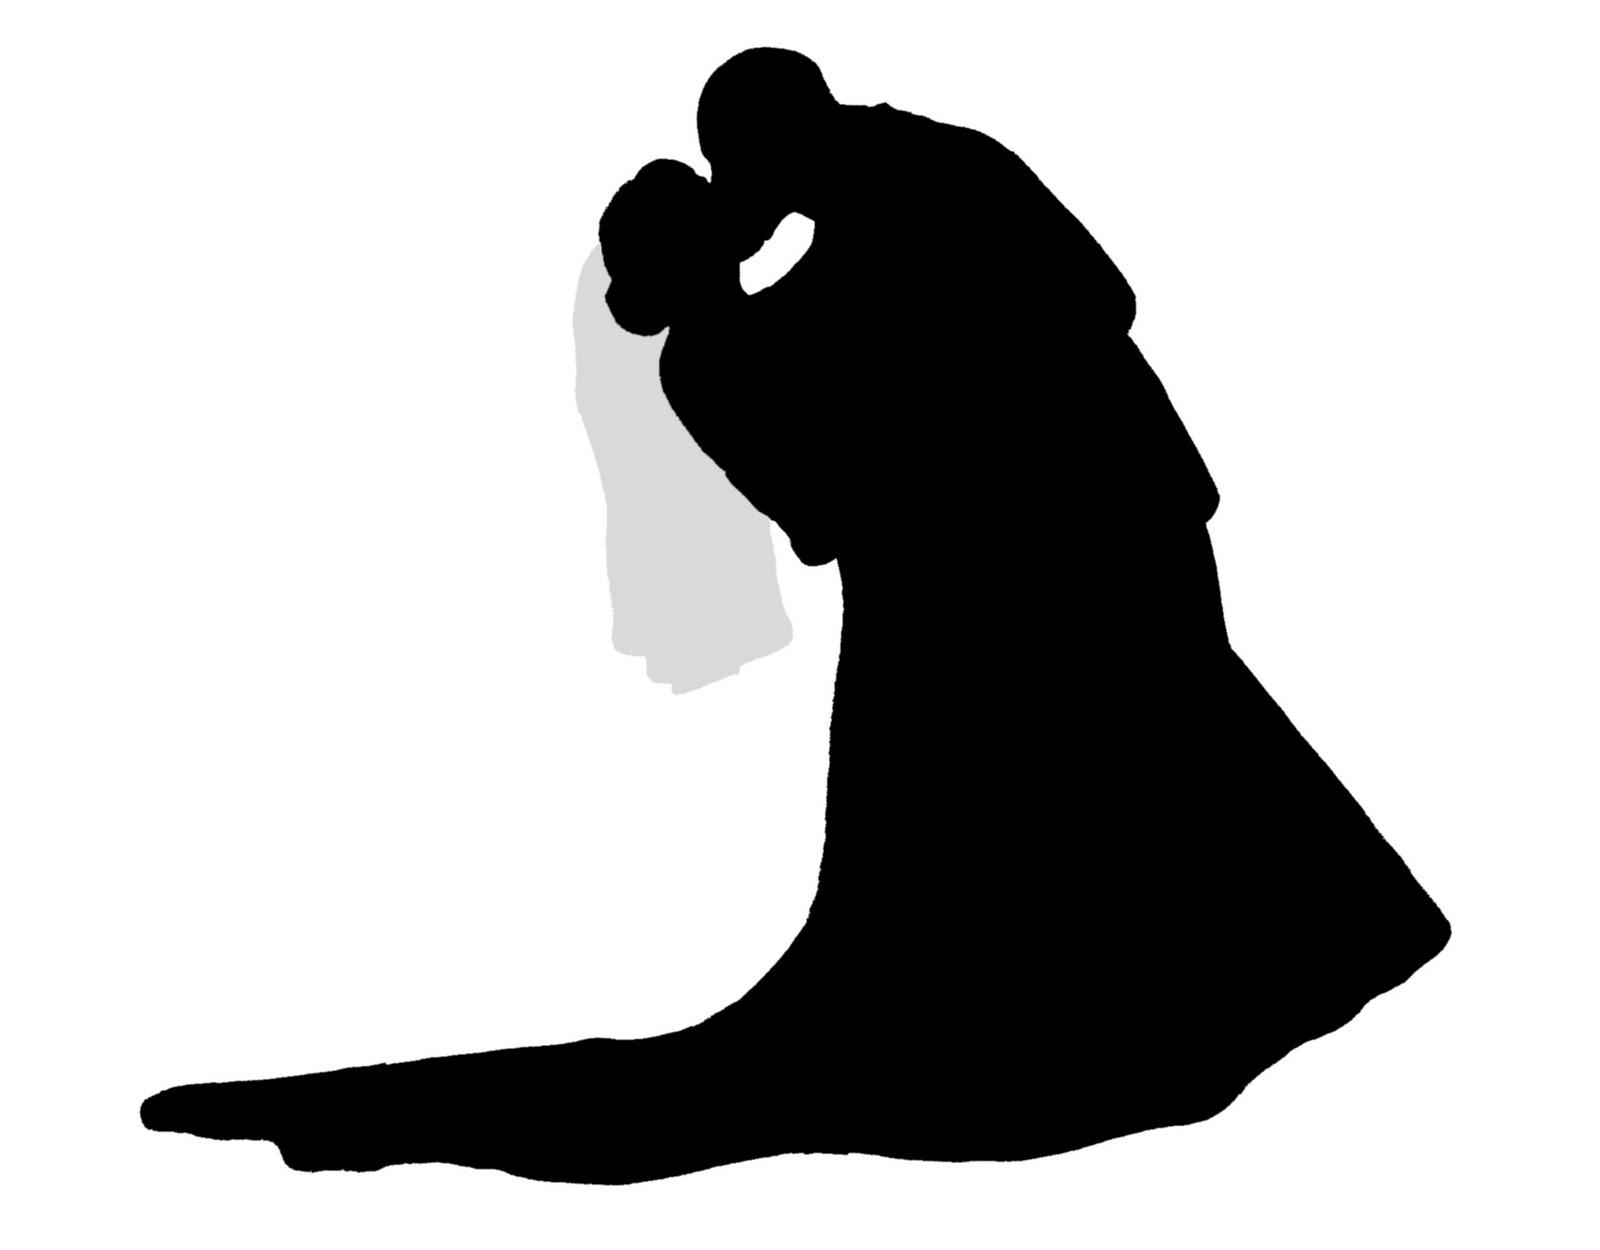 free wedding silhouette clip art - photo #28